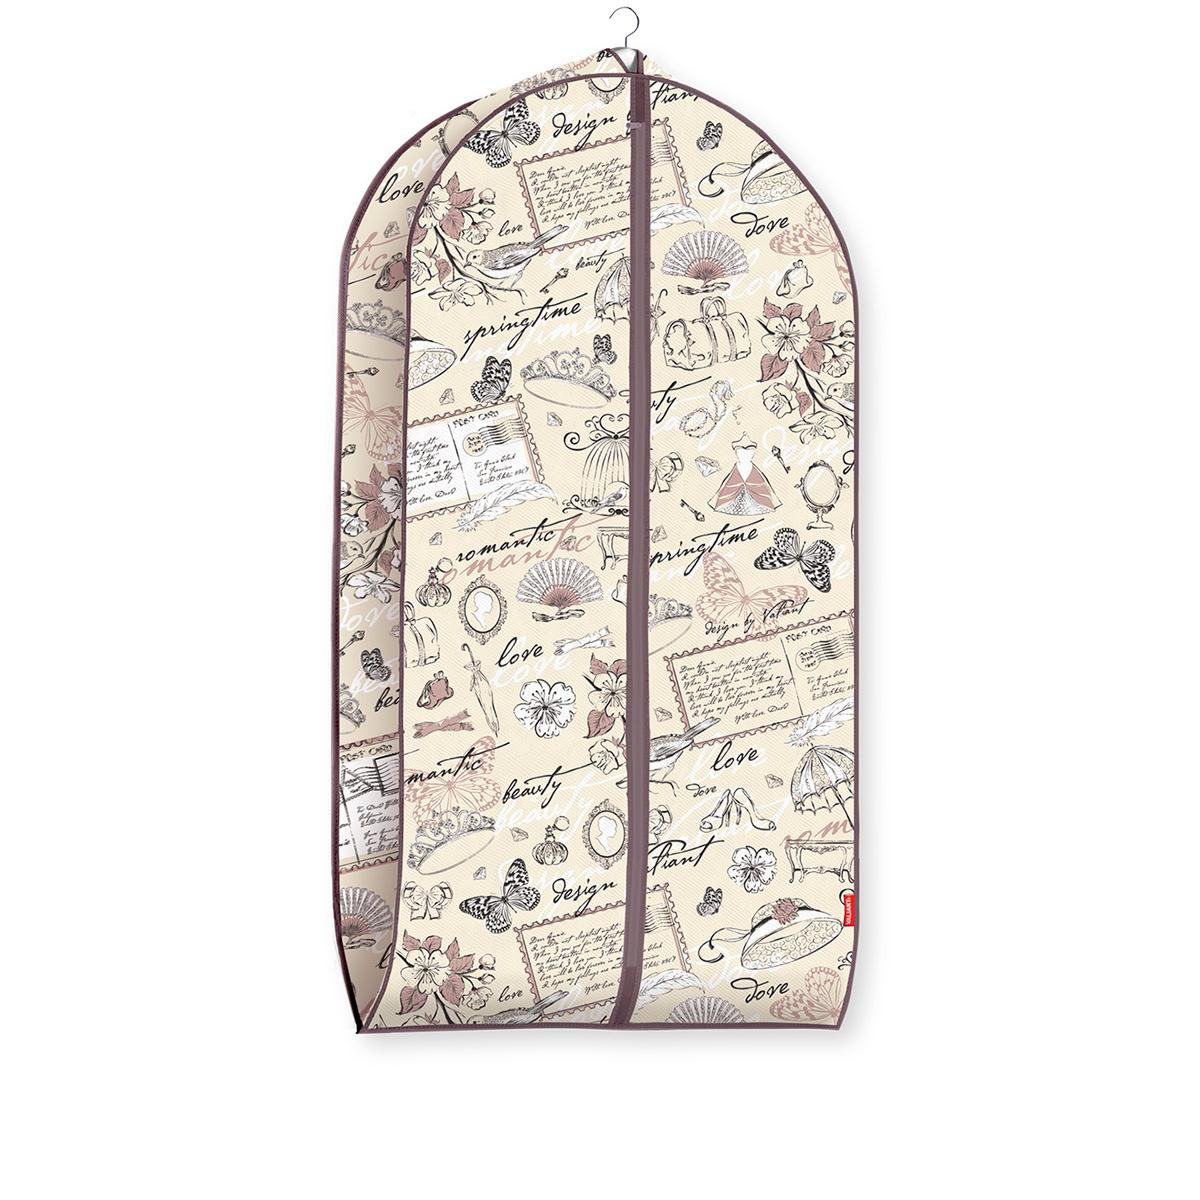 Чехол для одежды Valiant Romantic, объемный, 60 х 100 х 10 см чехол для одежды valiant classic объемный 60 х 100 х 10 см